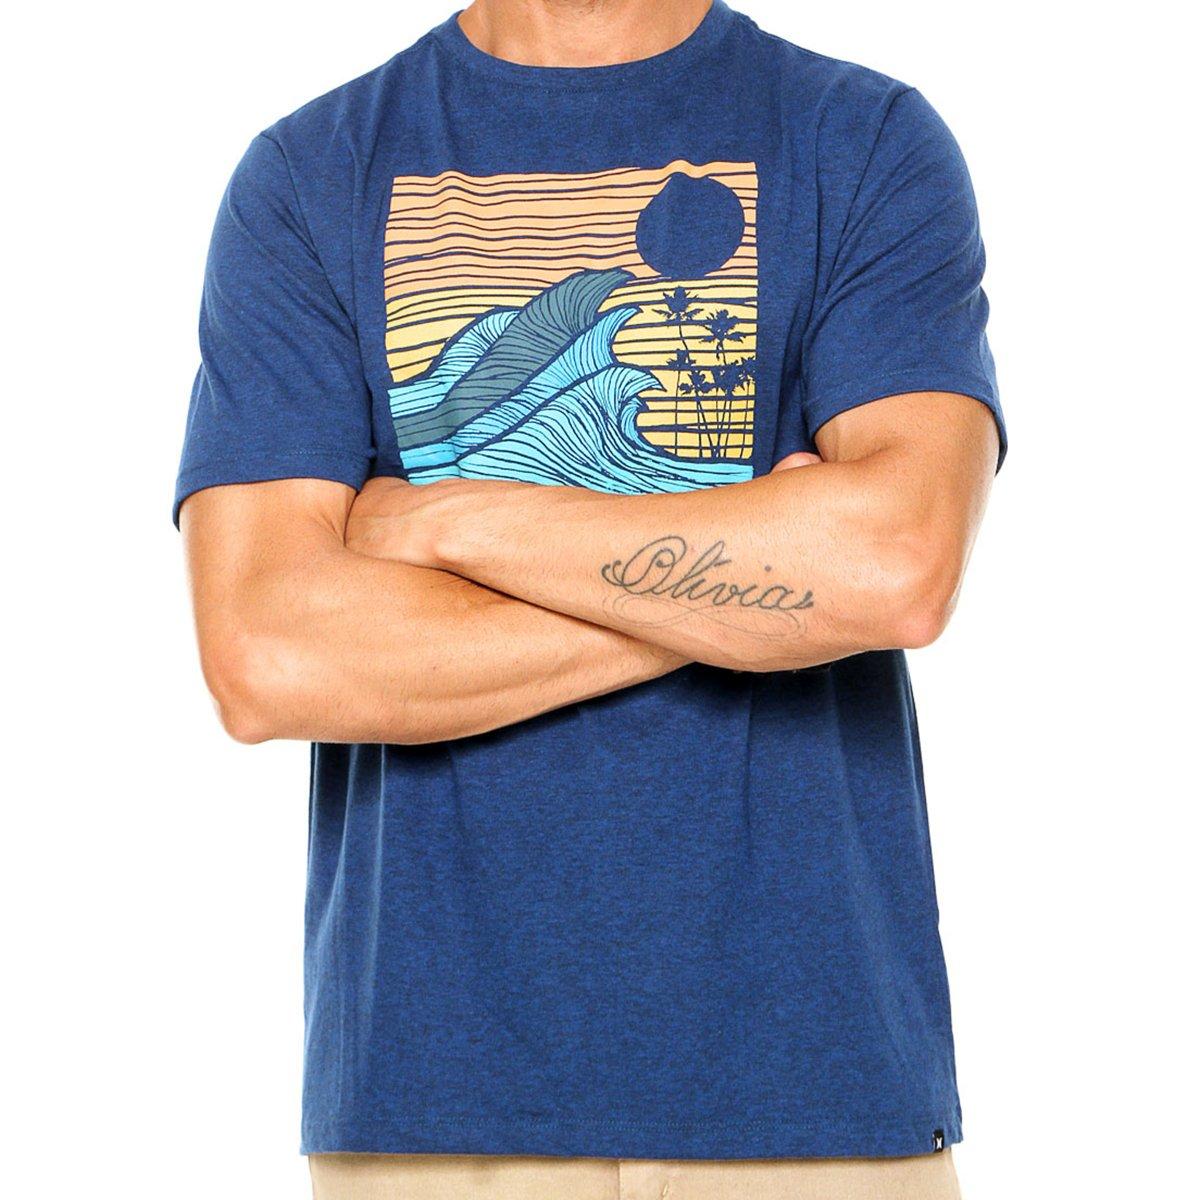 Camiseta Hurley Silk Tropical Target Masculina - Azul